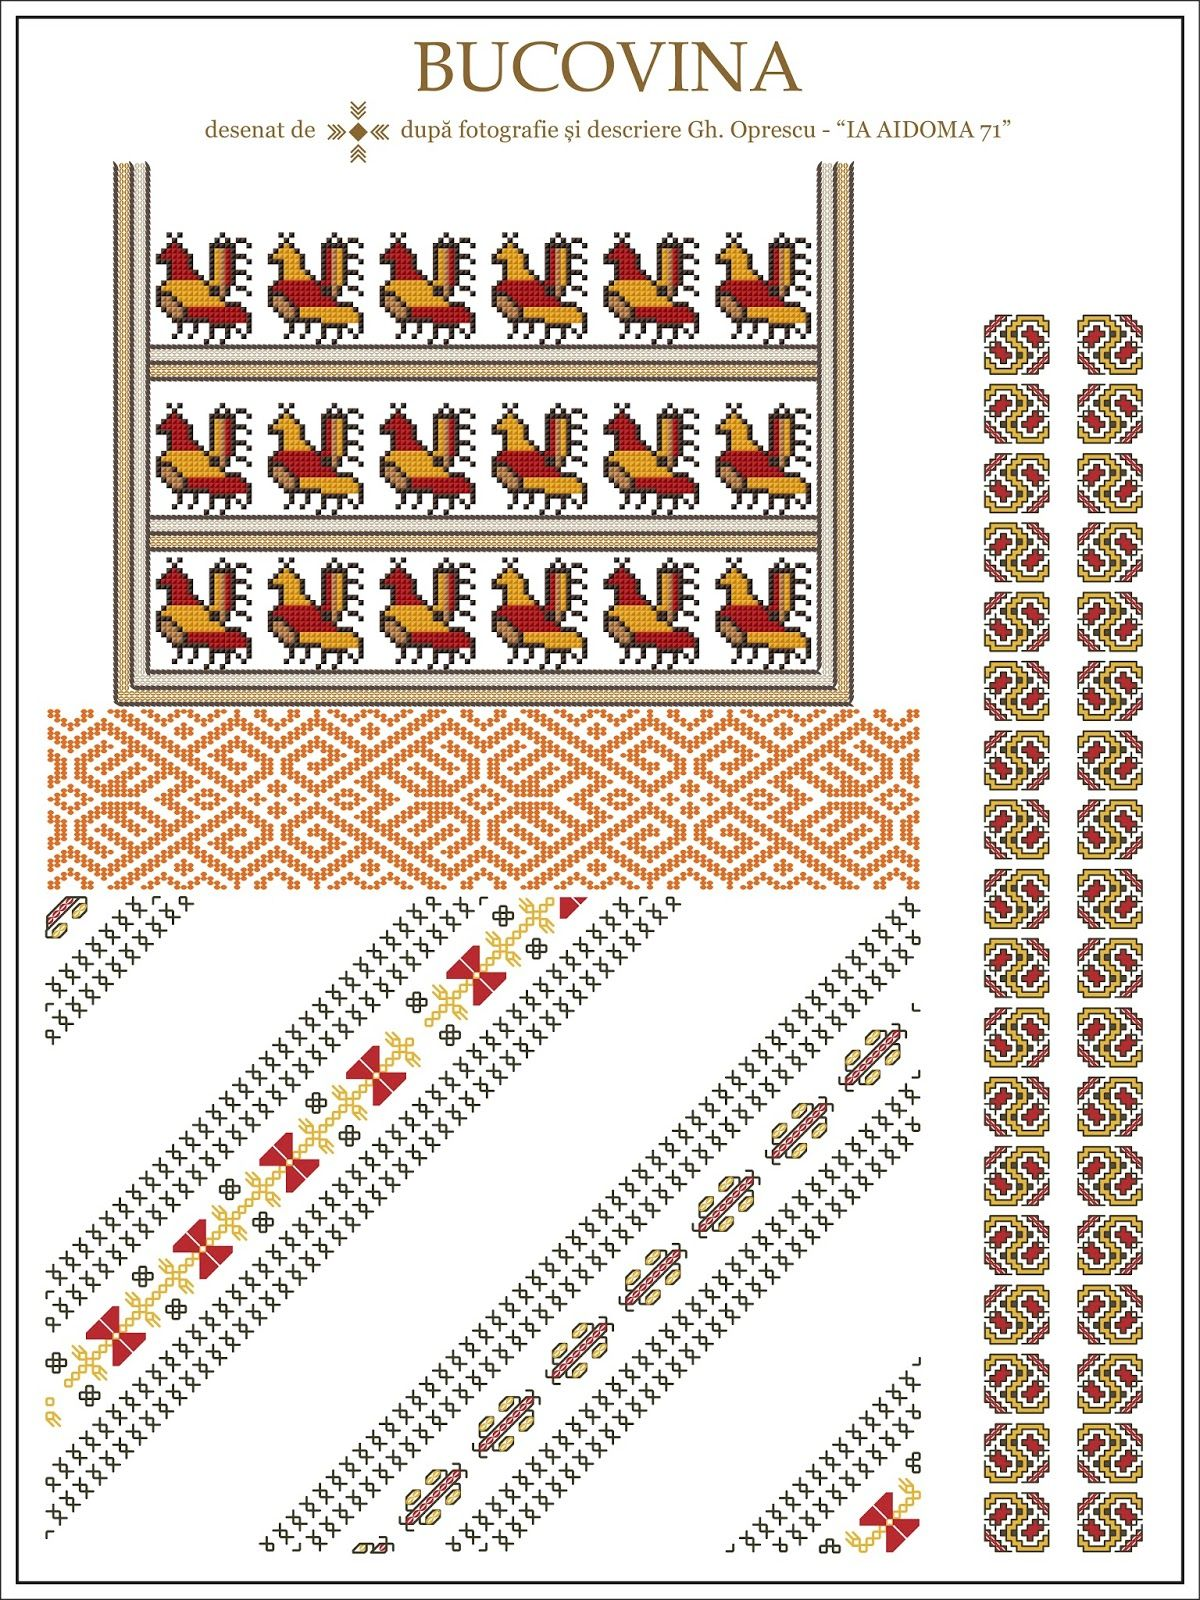 IA+AIDOMA+-+ie+71+-+bucovina+cu+cocosi.jpg (1200×1600)